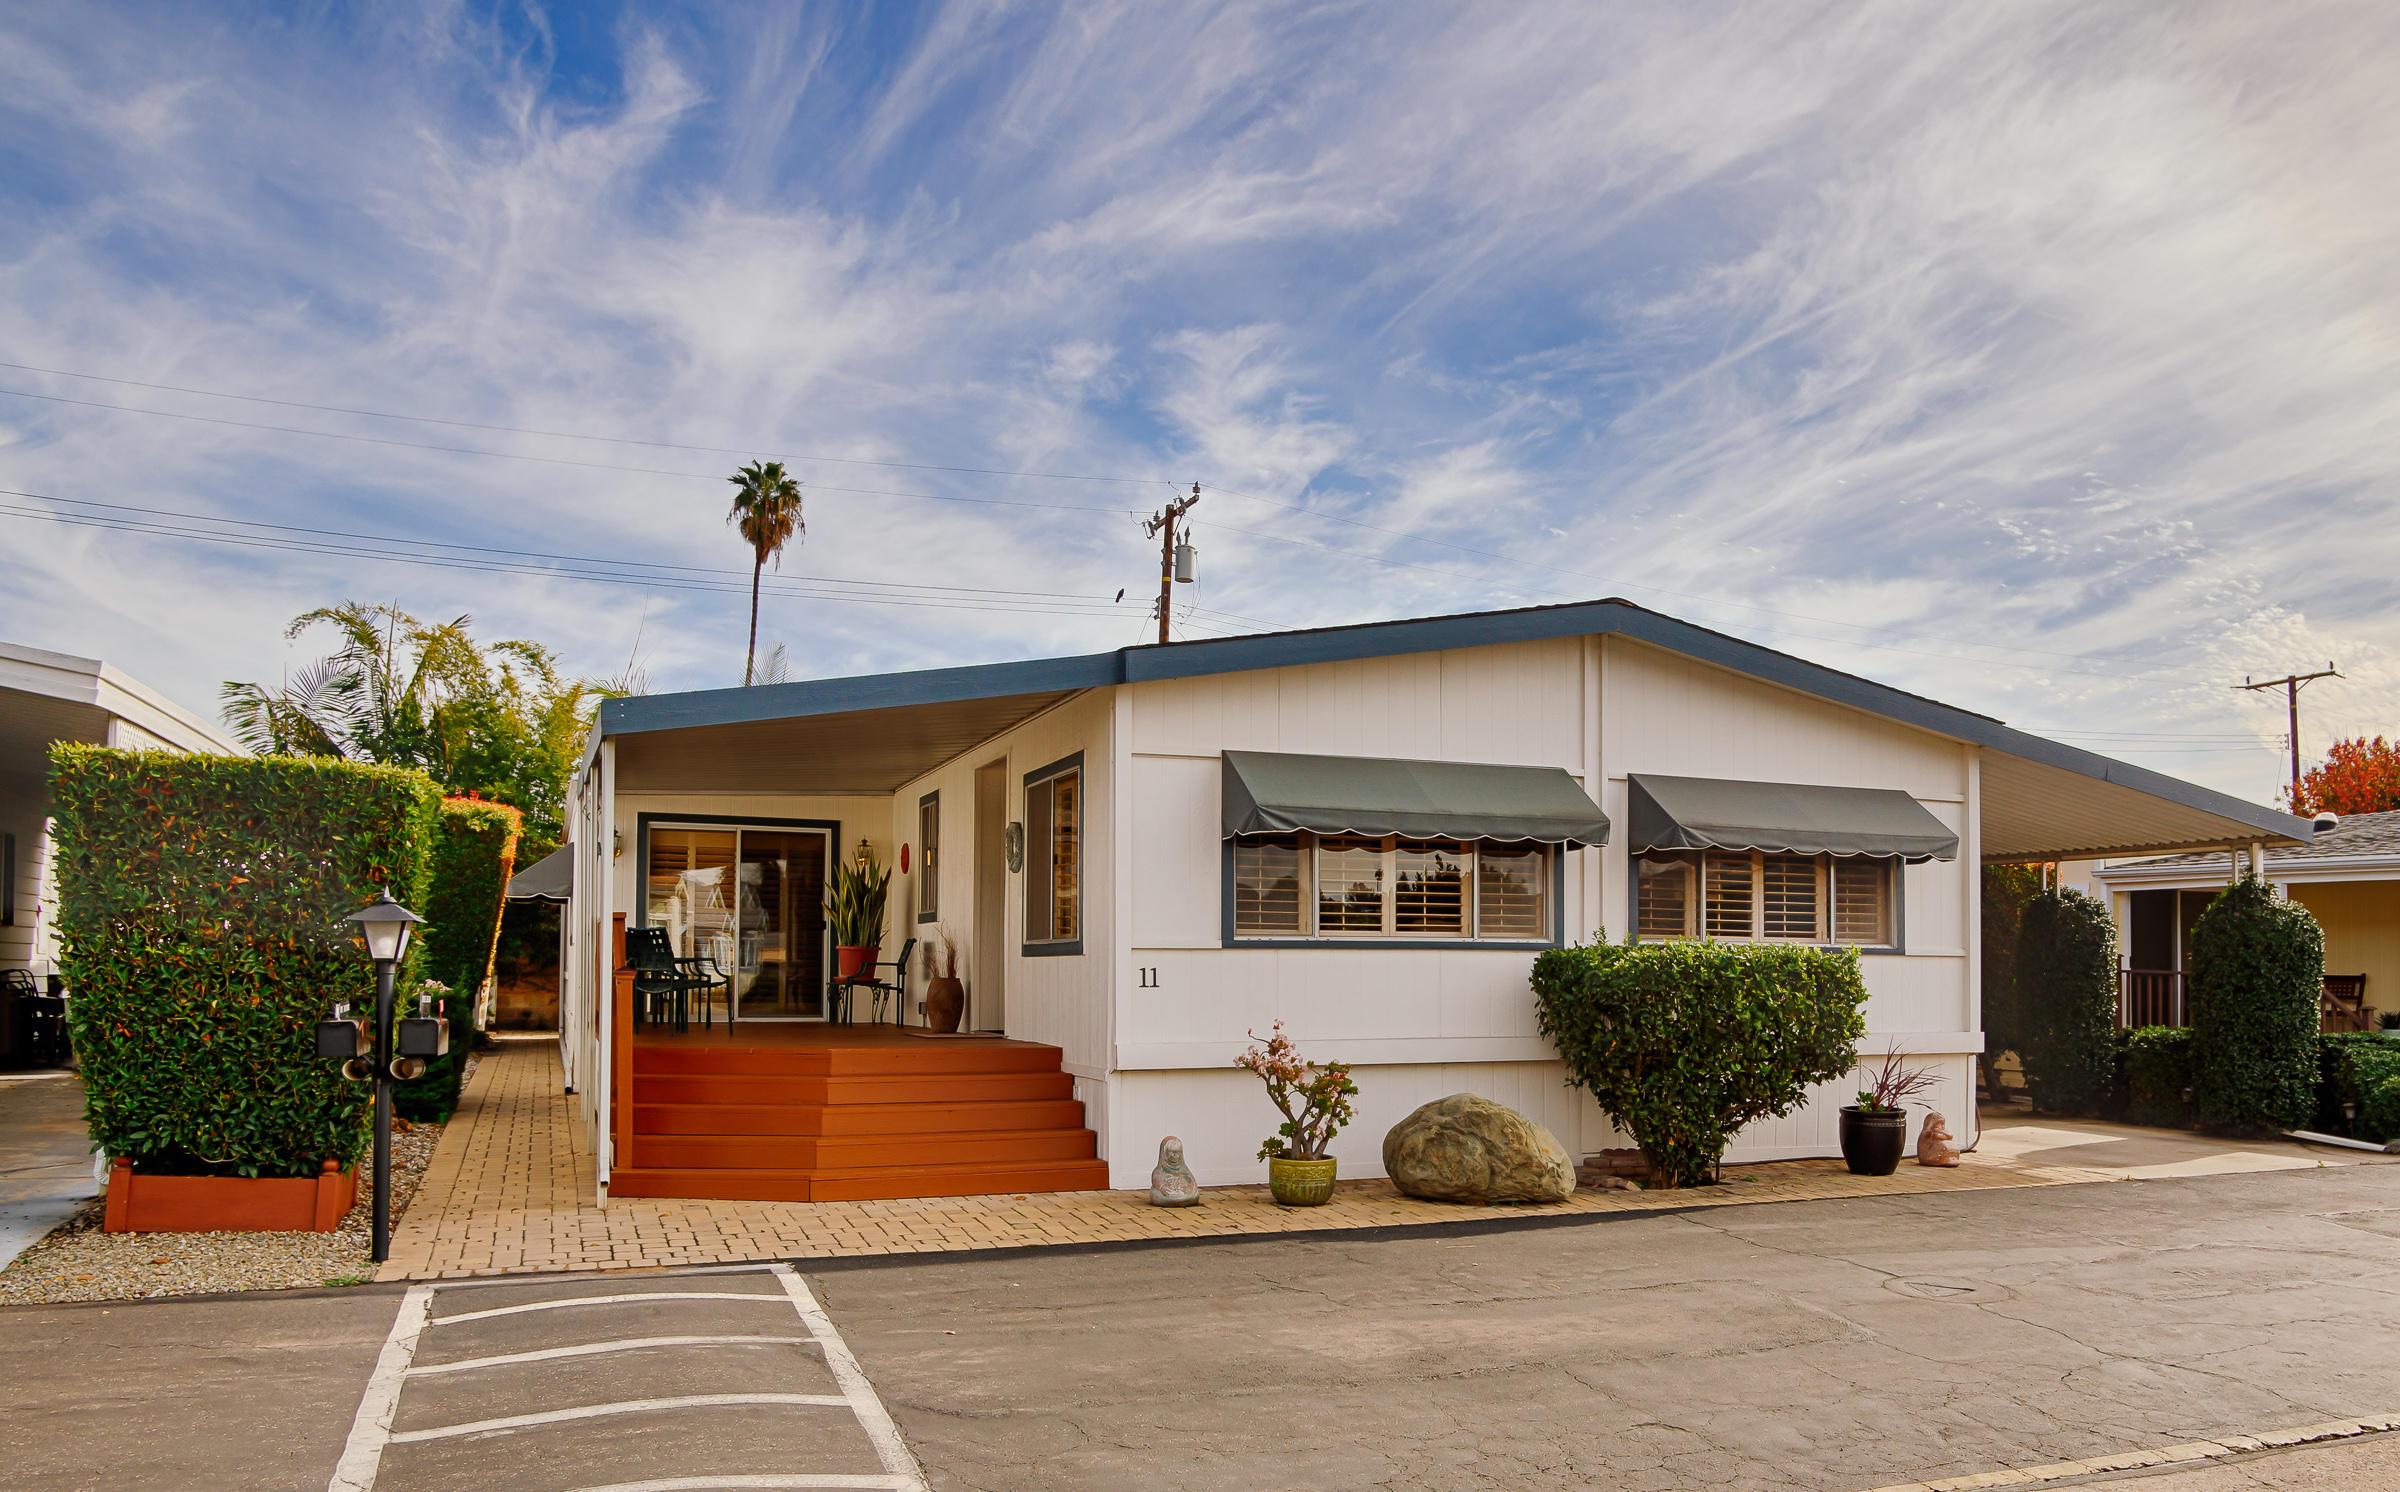 Property photo for 340 Old Mill Rd #Spc 11 Santa Barbara, California 93110 - 19-158